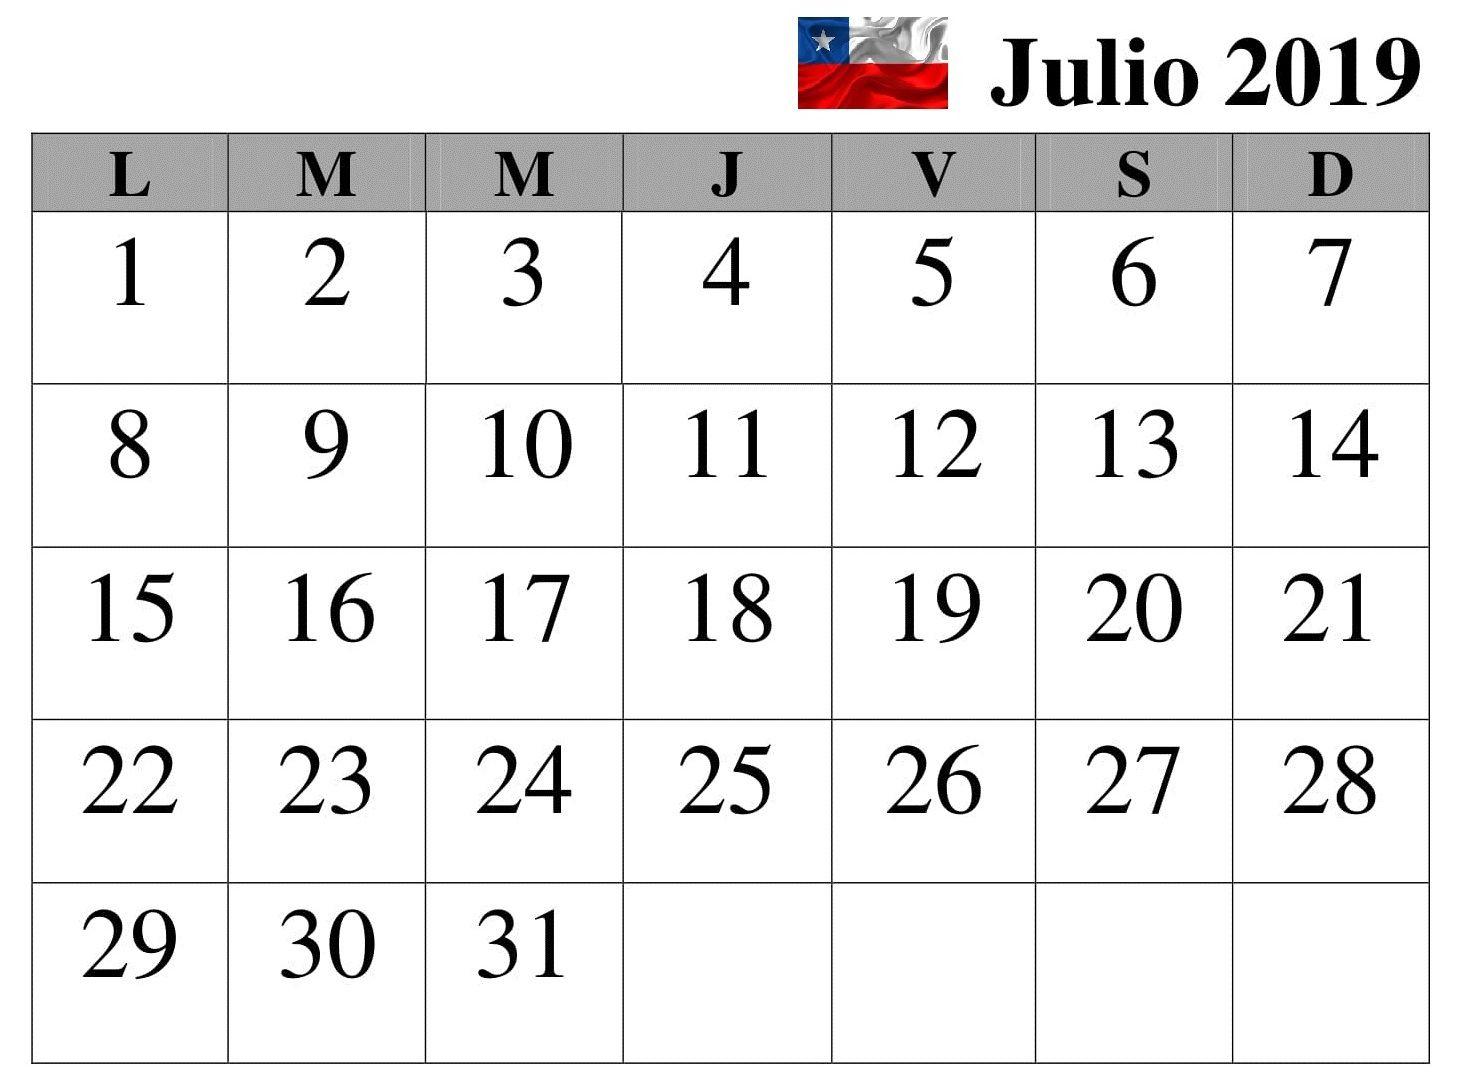 Calendario 2019 Julio Chile.Calendario 2019 Gratis Julio Chile Mensual Vacaciones